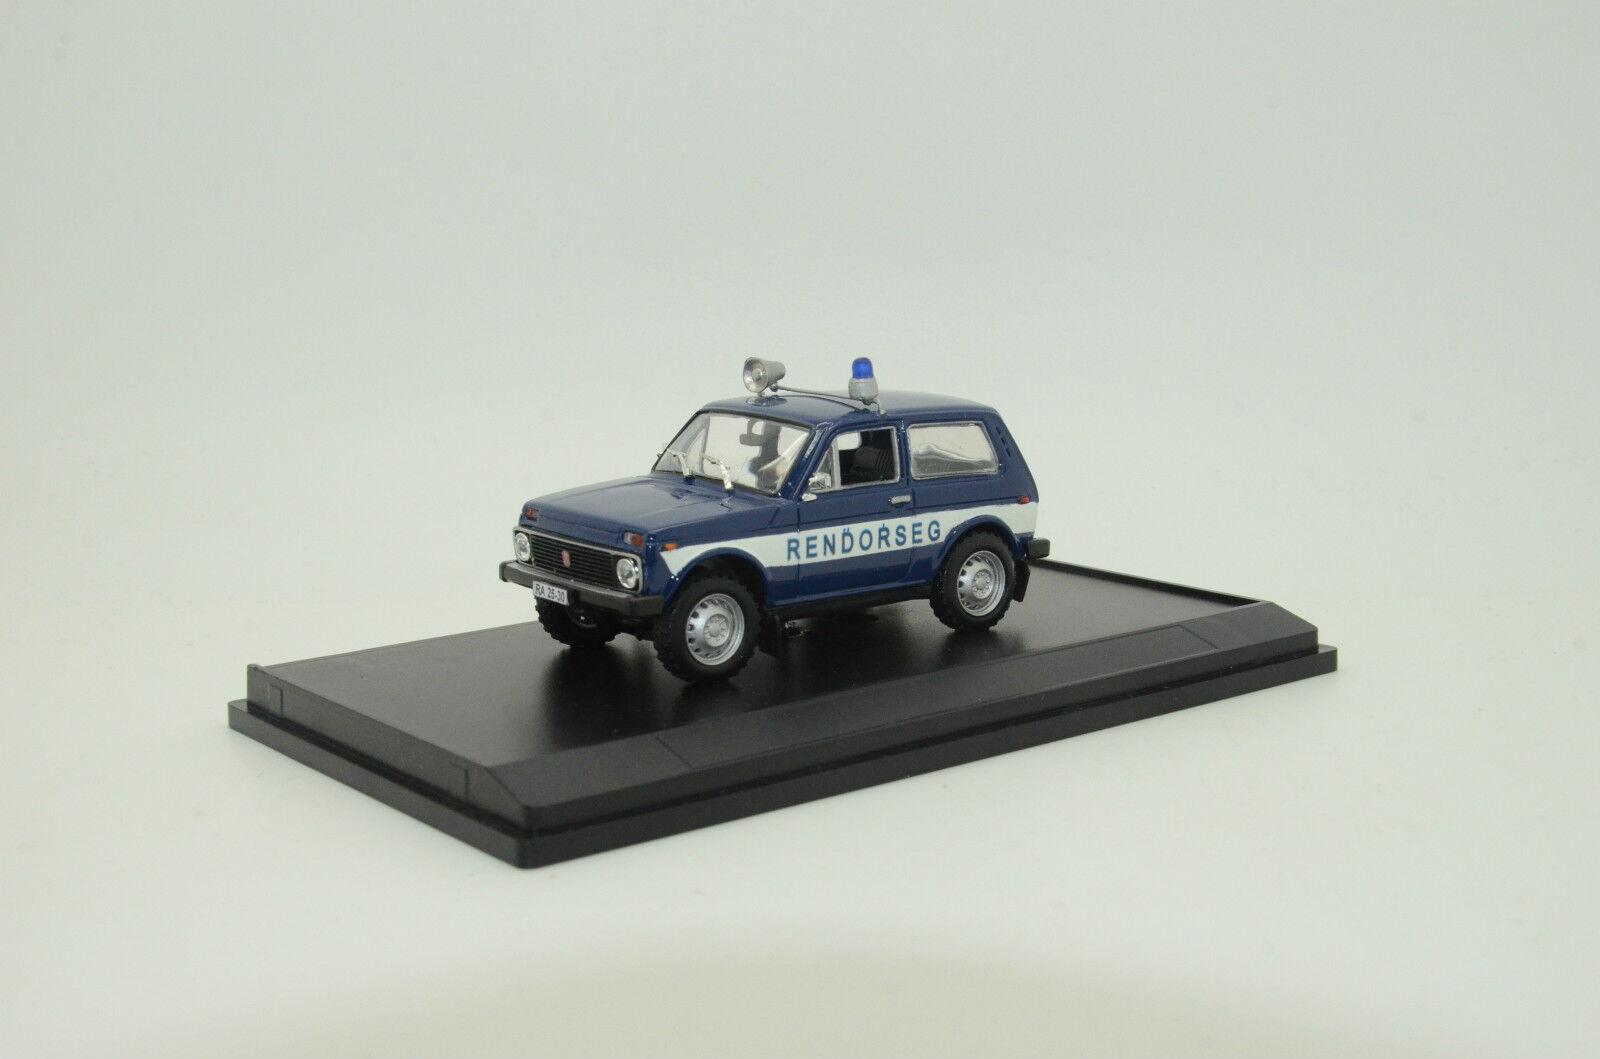 Rara LADA VAZ 2121 rendorseg rendőrség Hungría policía Hecho a Medida 1 43